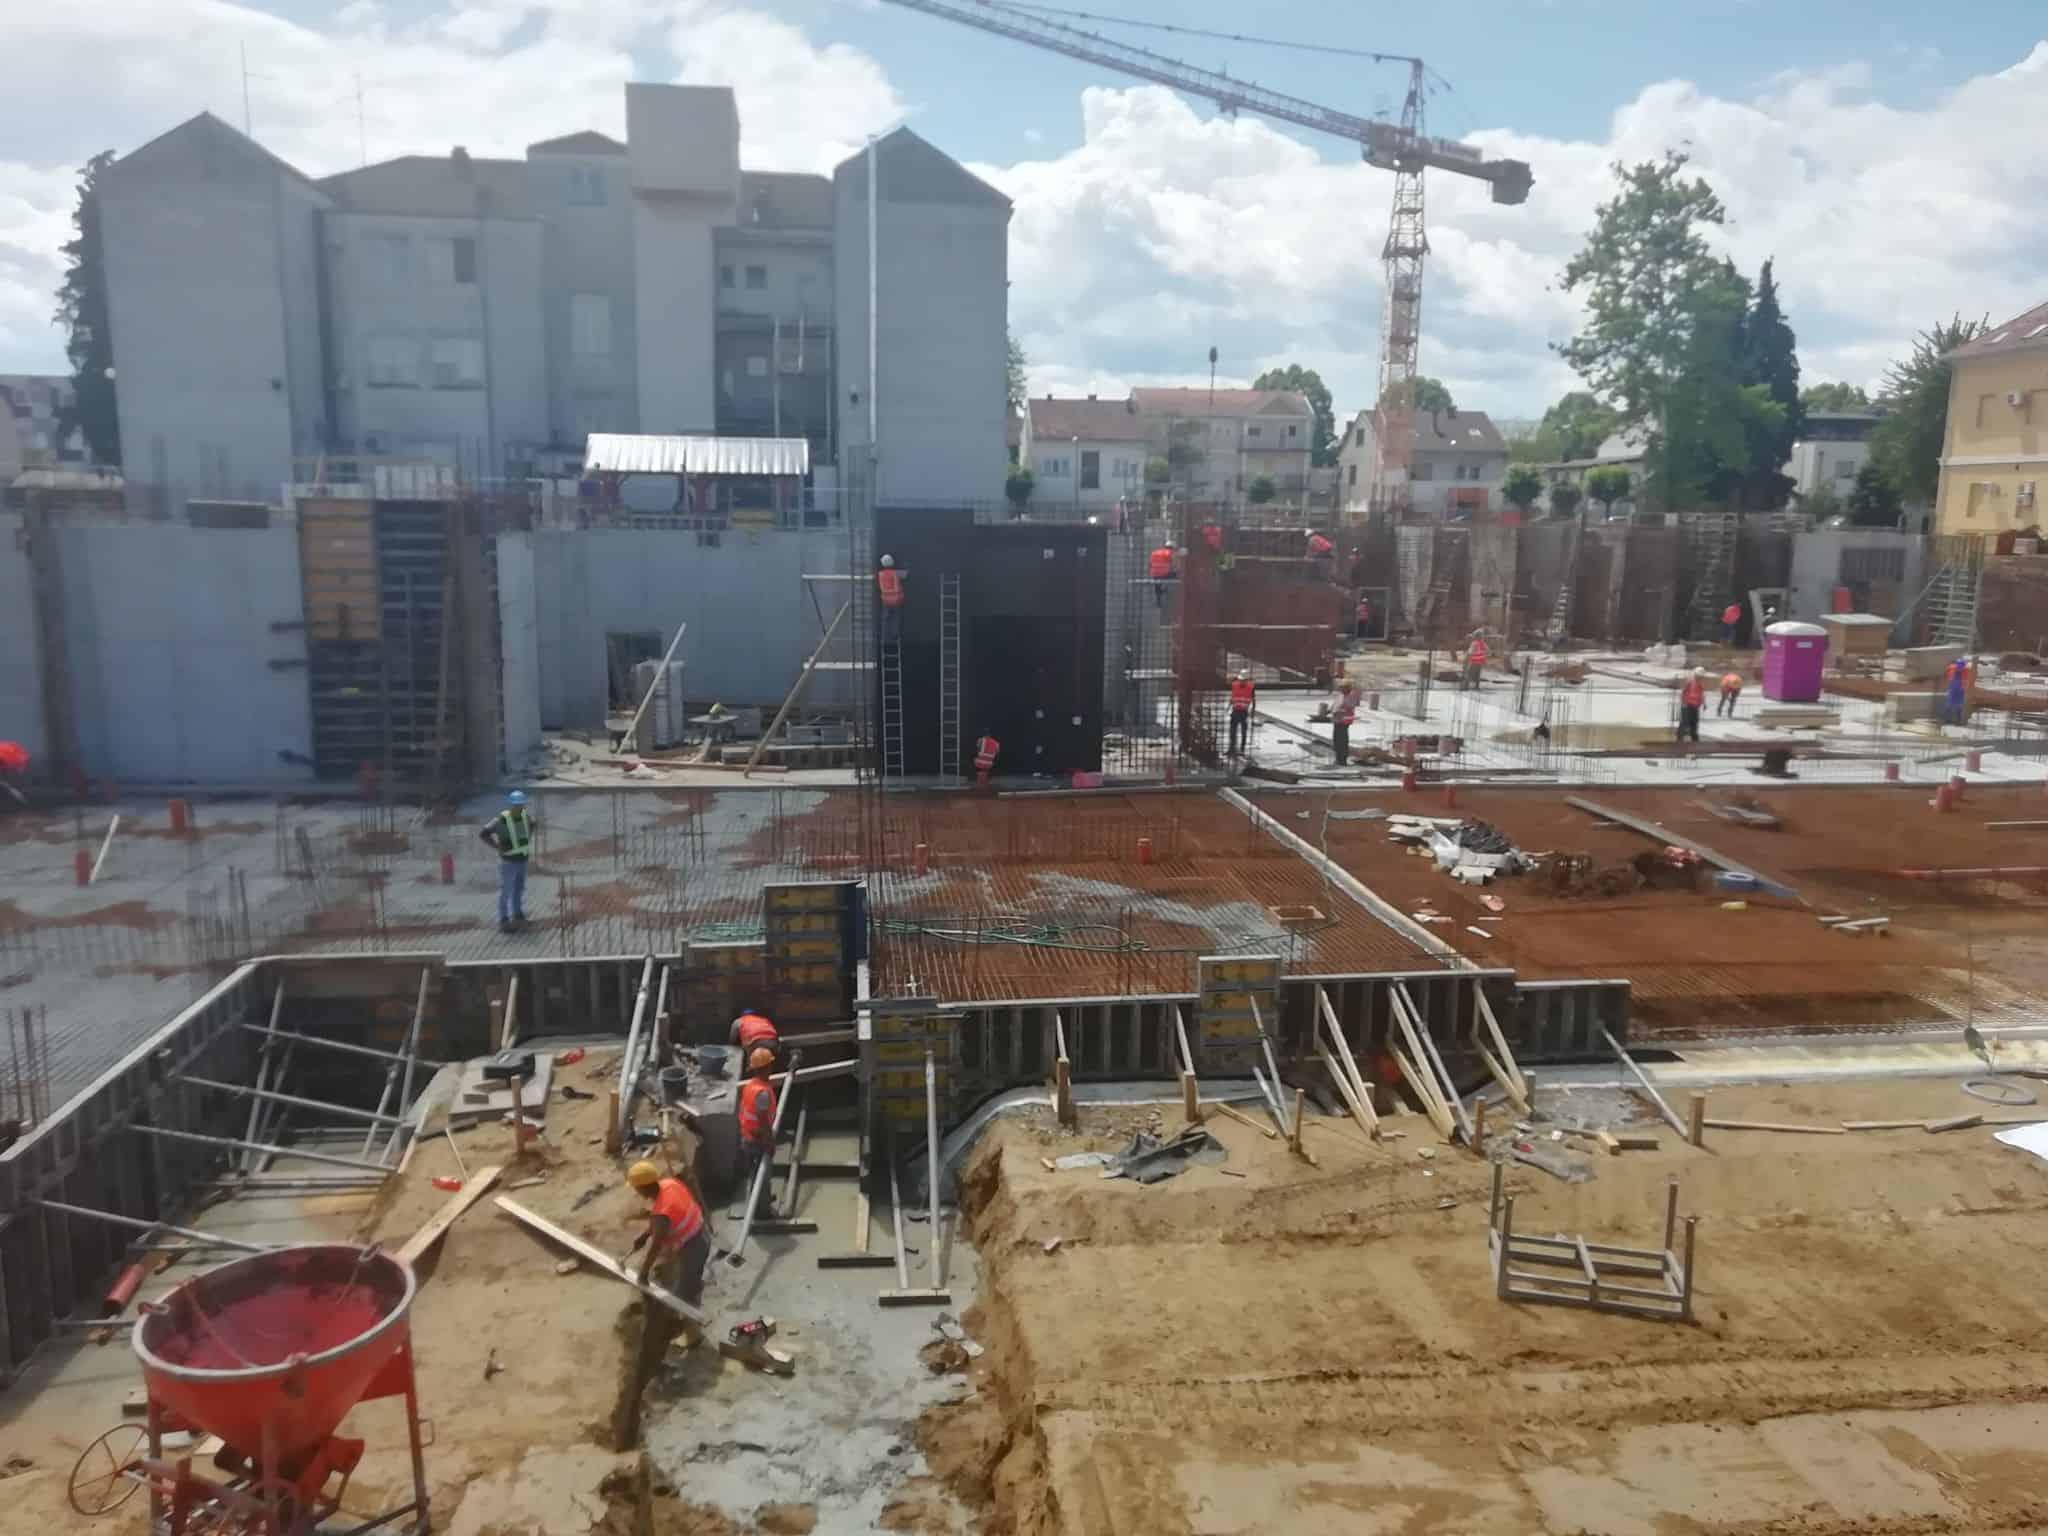 SLUČAJ 'BJELOVARSKA BOLNICA' Zatresli se temelji Bajsova kapitalnog projekta